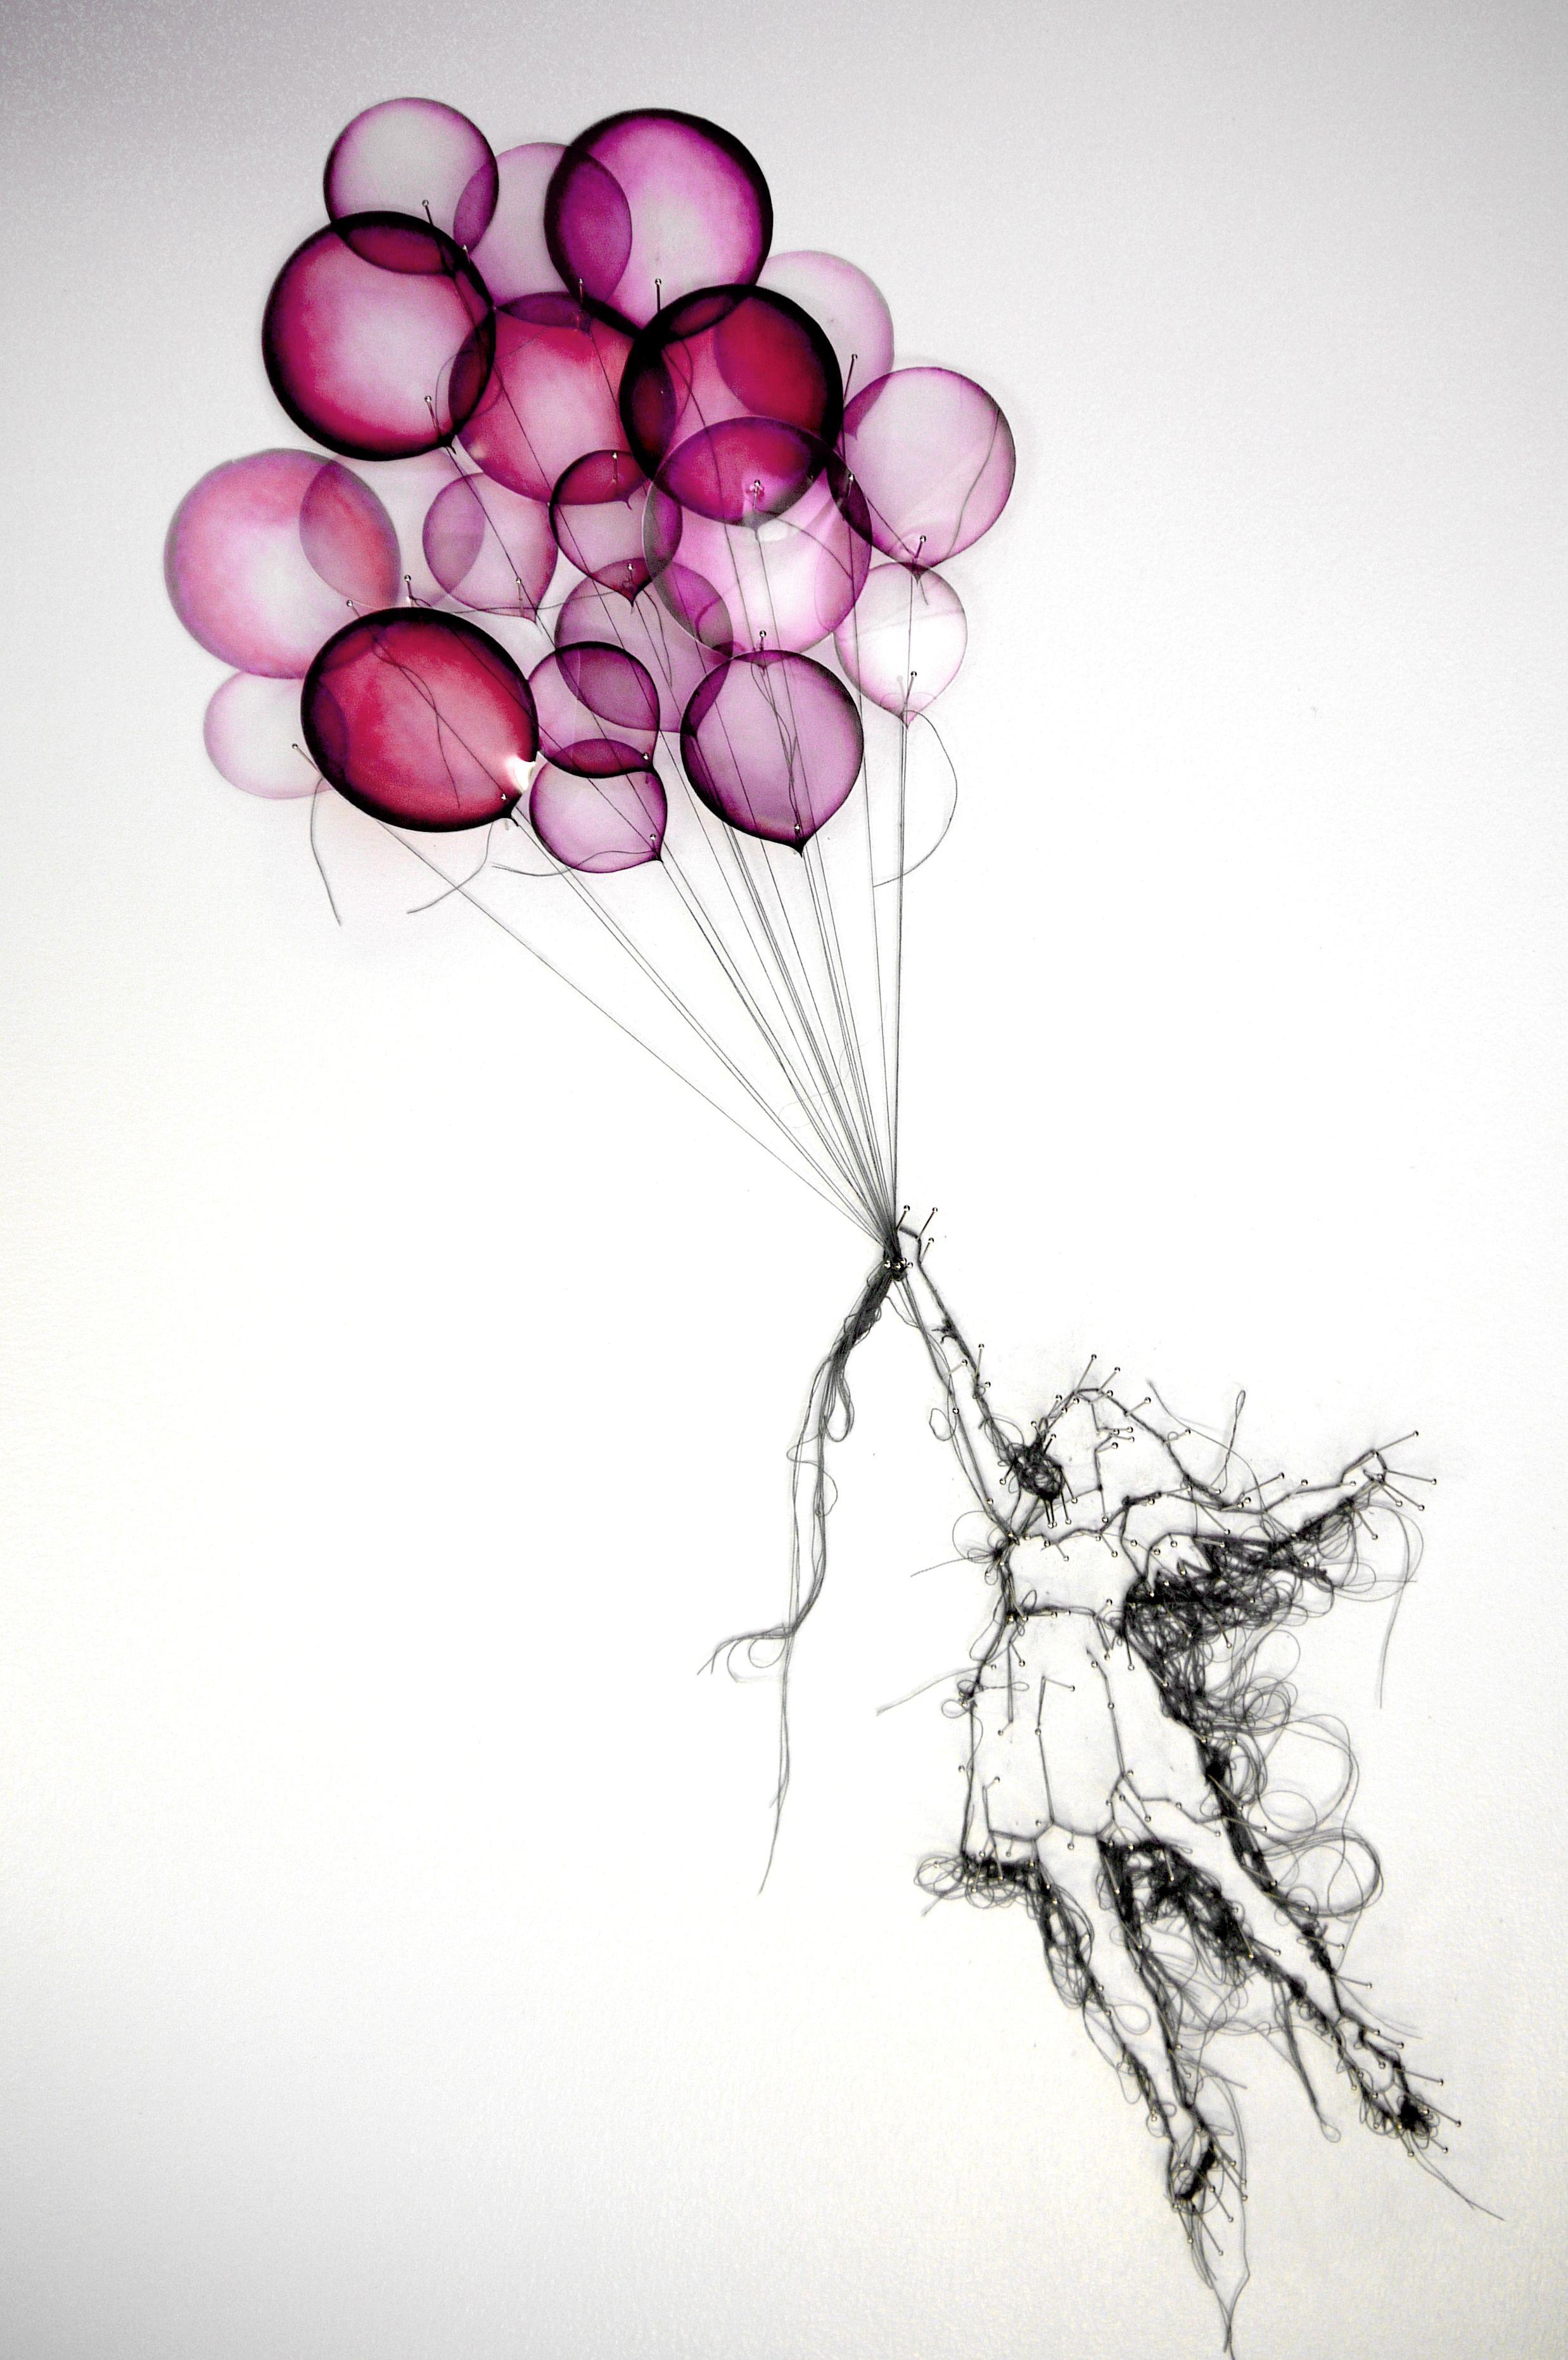 Http debbie smyth com mixed media balloon girl